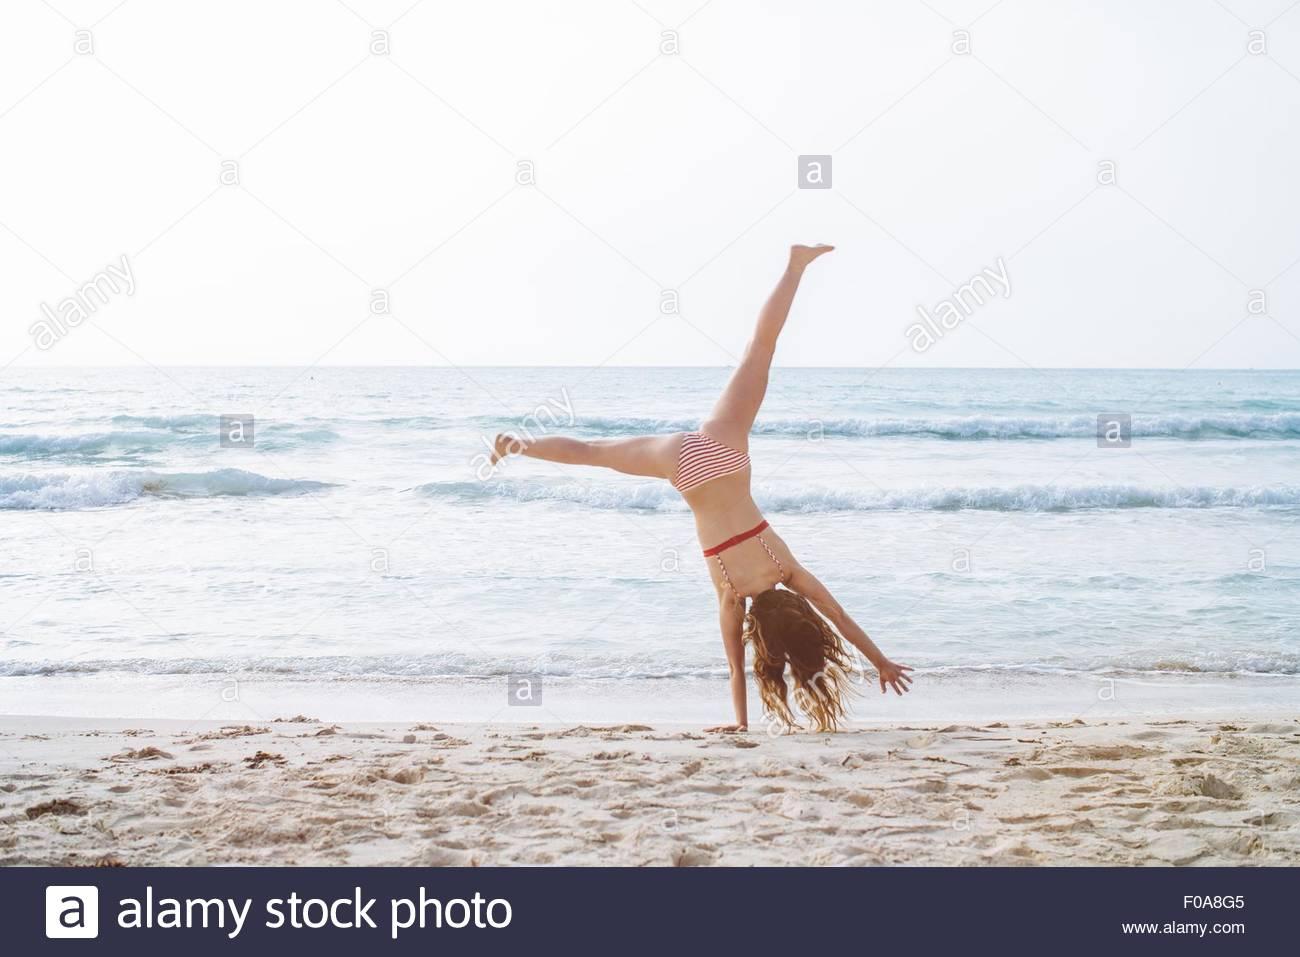 Young woman wearing bikini cartwheeling on beach Photo Stock